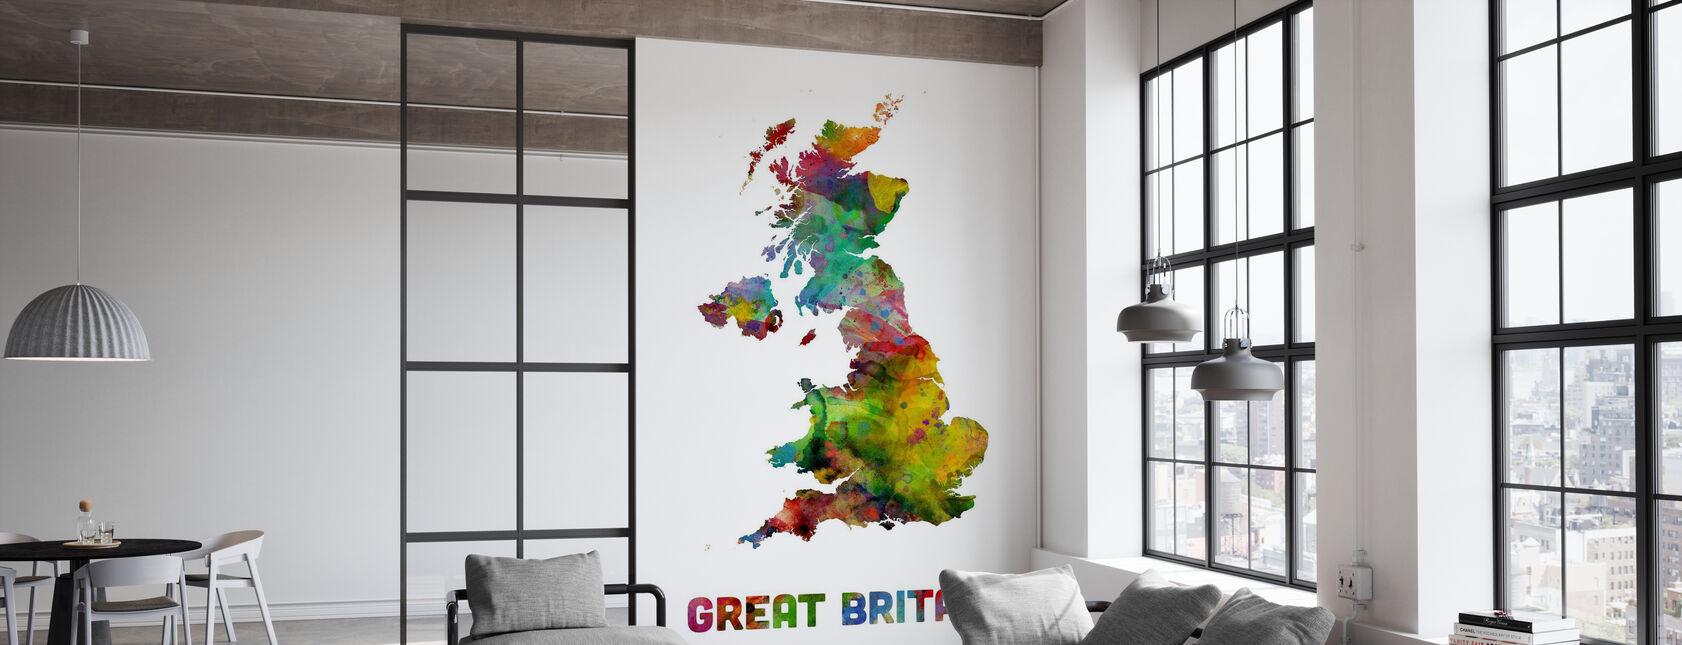 Great Britain Watercolor Map - Wallpaper - Office